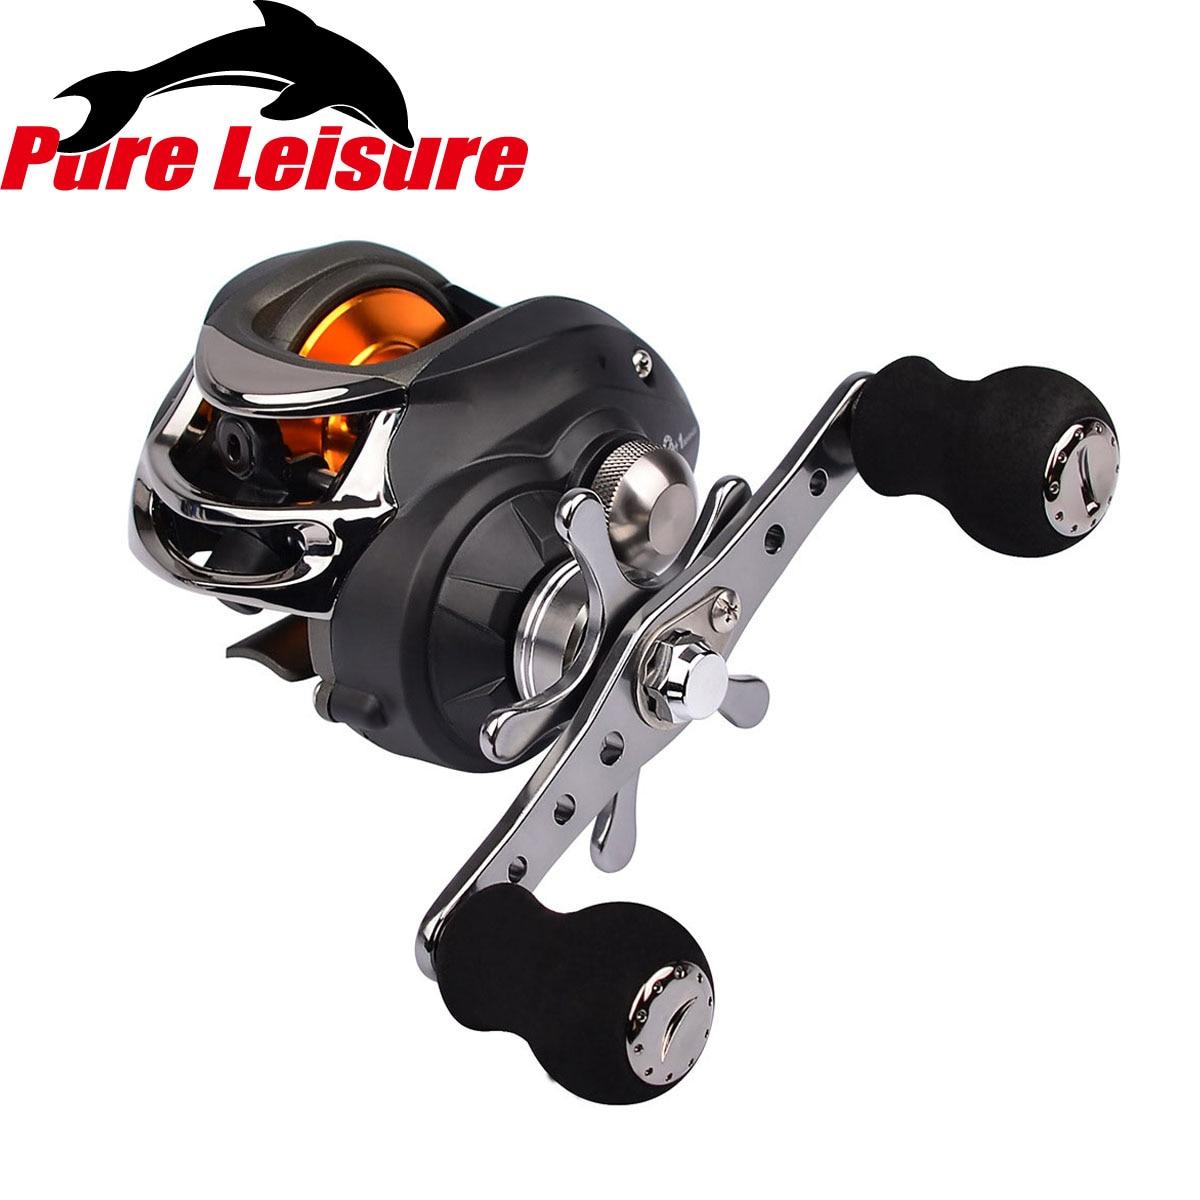 PureLeisure Ice Fishing Reels 10 Axis Drop Wheel 6.3:1 River Lake Fishing Reel Fish Gear 9+1BB Lure Fishing Reel Left /Right